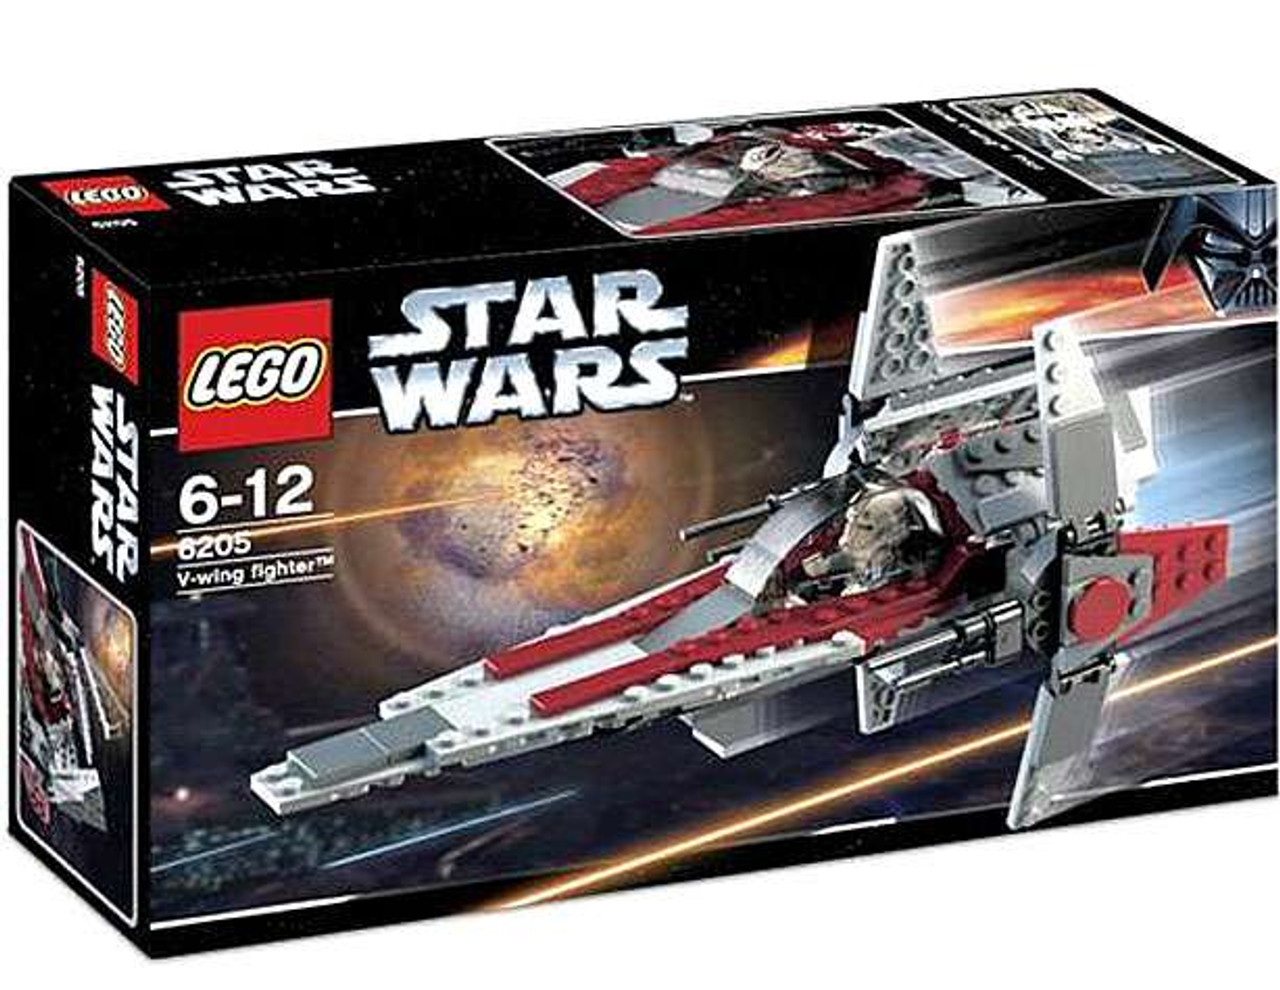 LEGO Star Wars Revenge of the Sith V-Wing Fighter Set #6205 [Damaged Package]